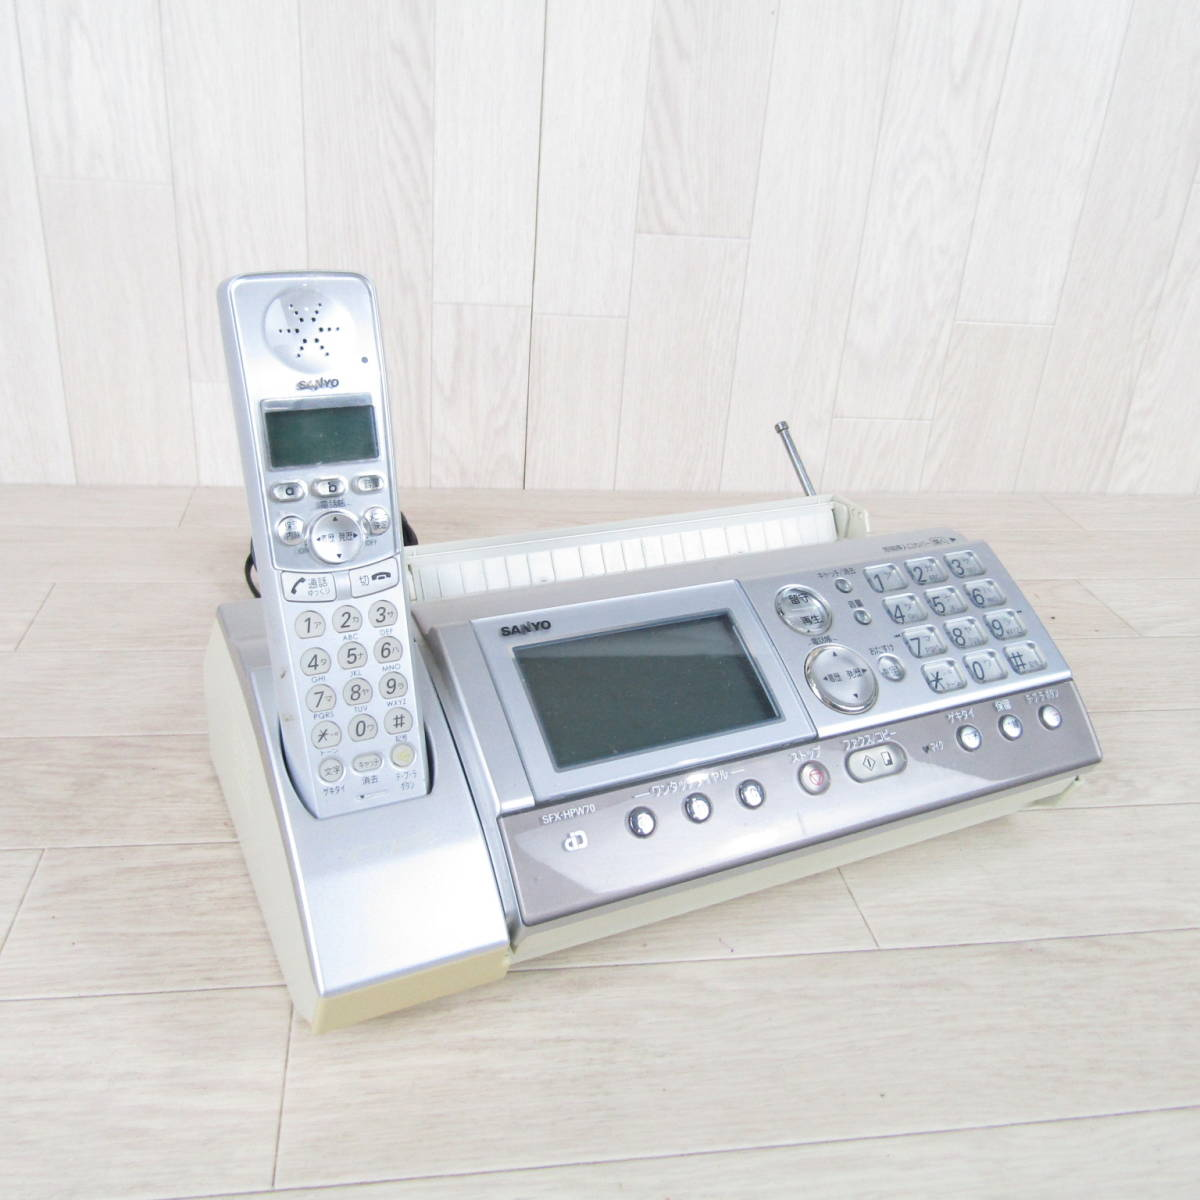 QB1473【1円スタート 激安 生活用品】ファクシミリ電話機 サンヨー SFX-HPW70 FAX 子機 生活家電 家庭用 SANYO ファックス